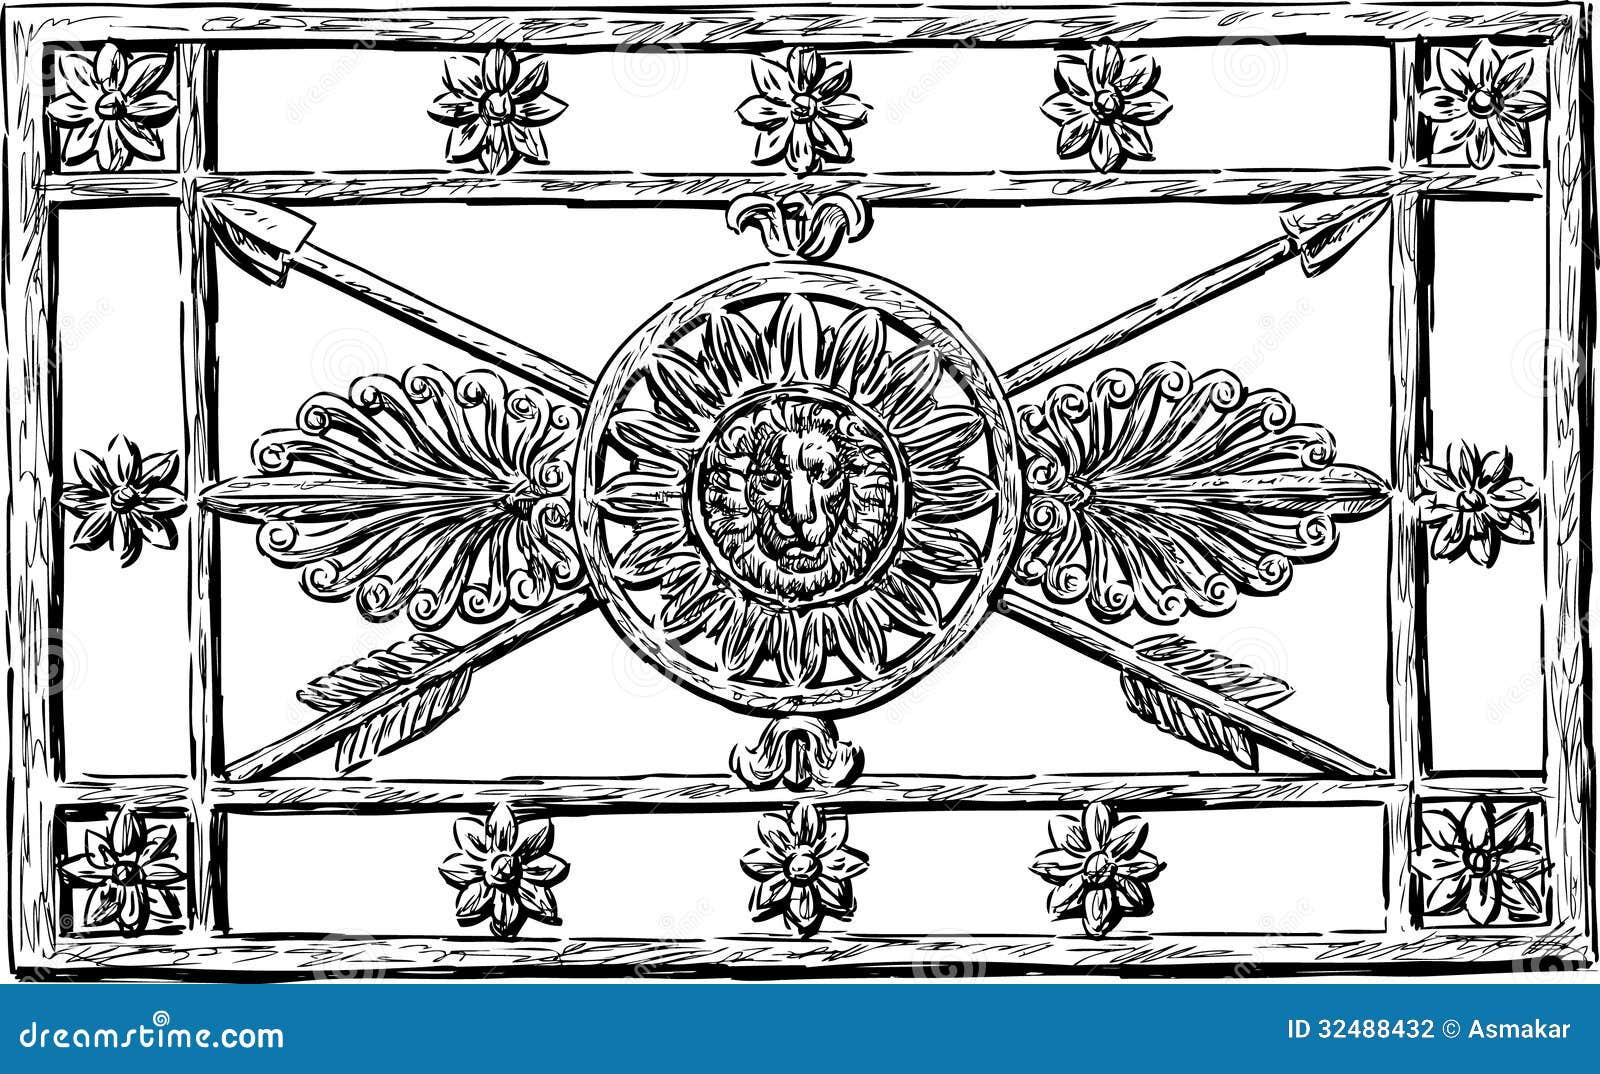 Decorative Metal Grates Decorative Grate Stock Photography Image 32488432